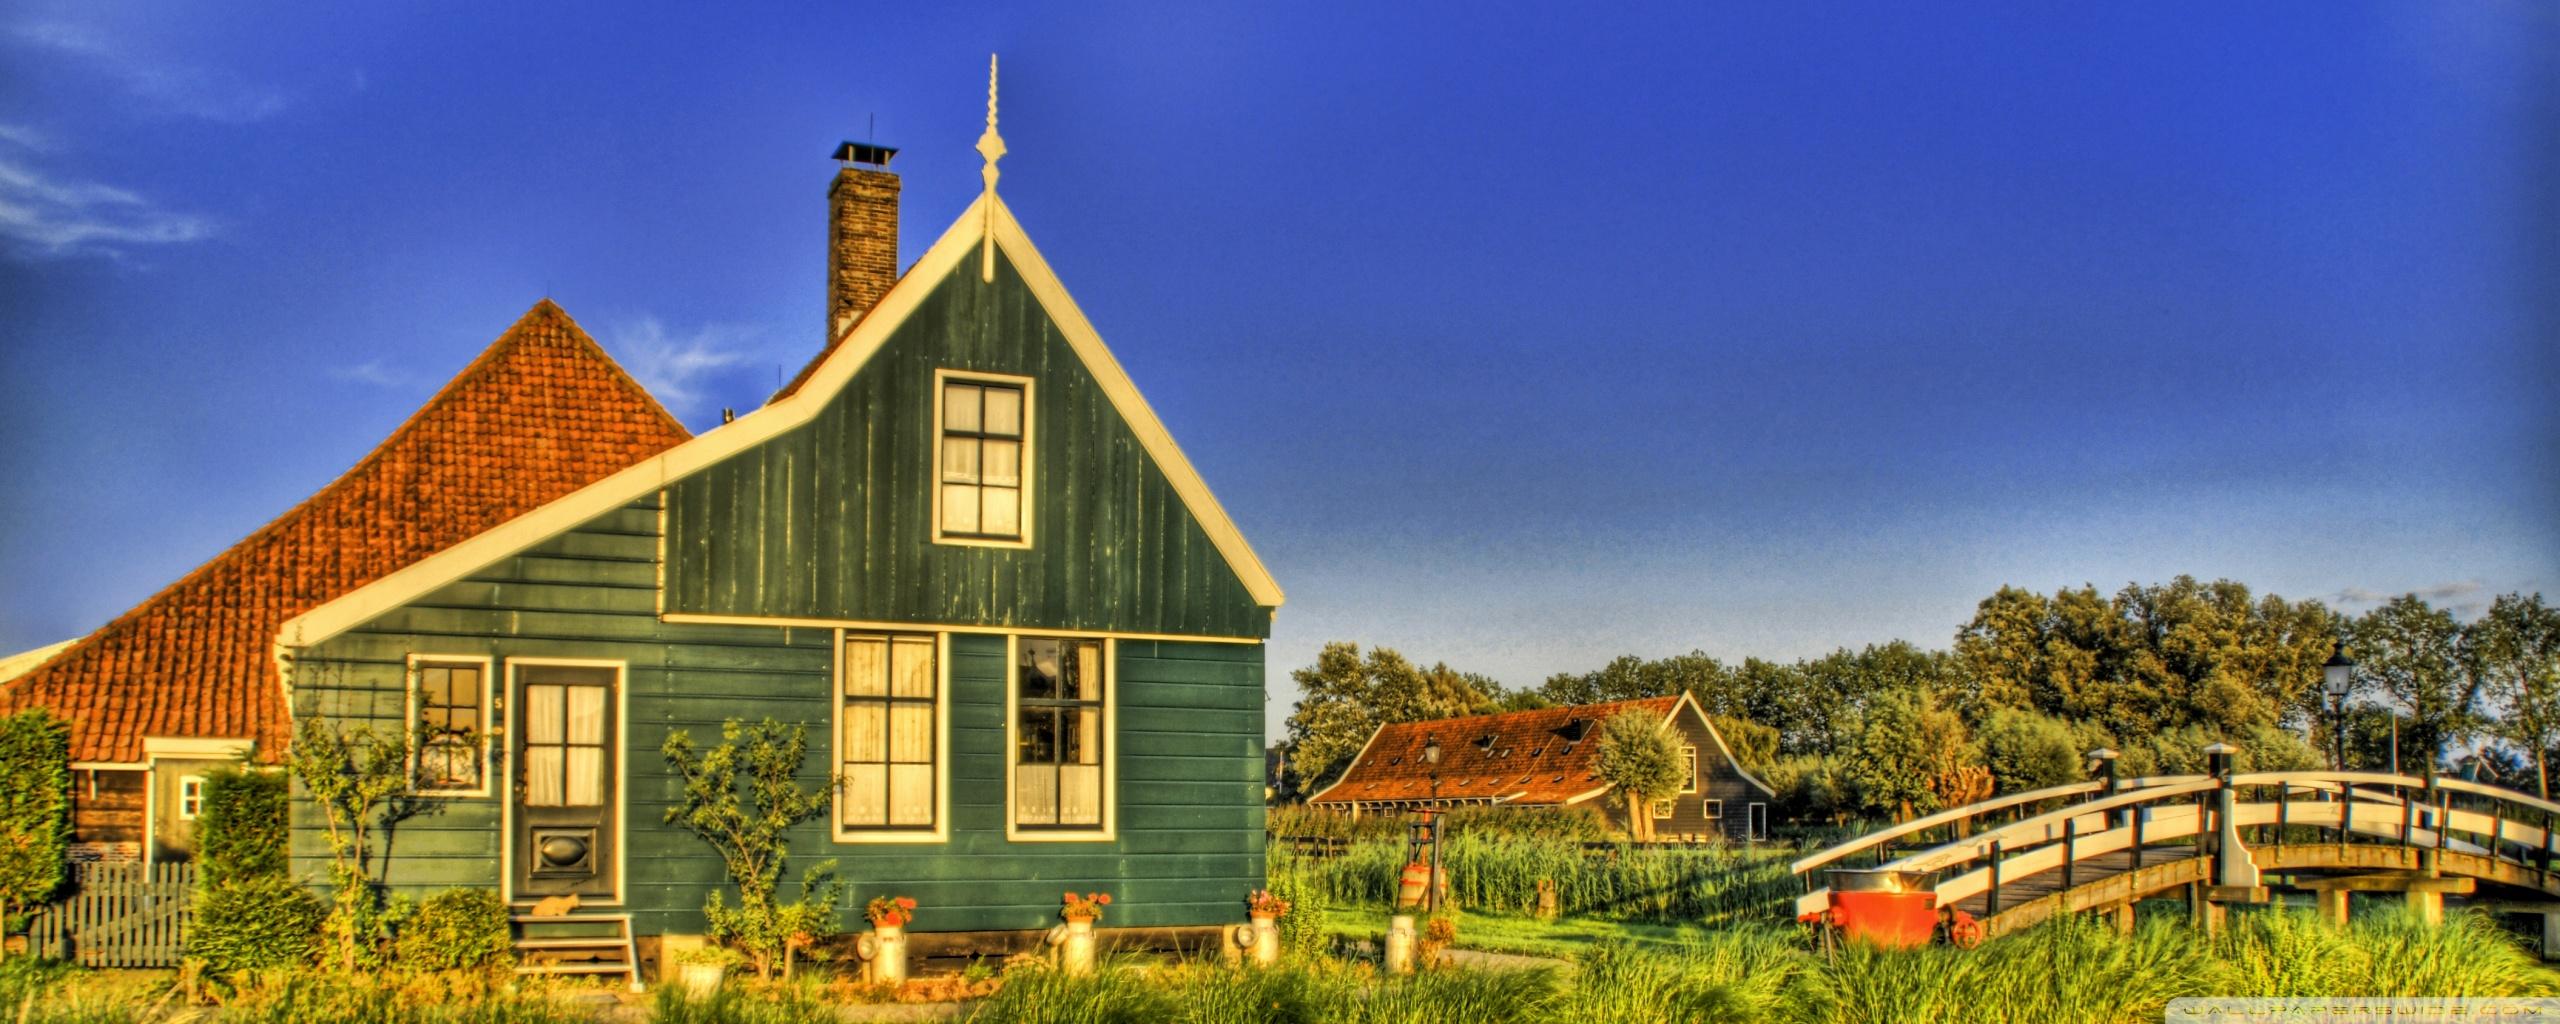 Holland Farmhouse 4K HD Desktop Wallpaper for 4K Ultra HD TV 2560x1024